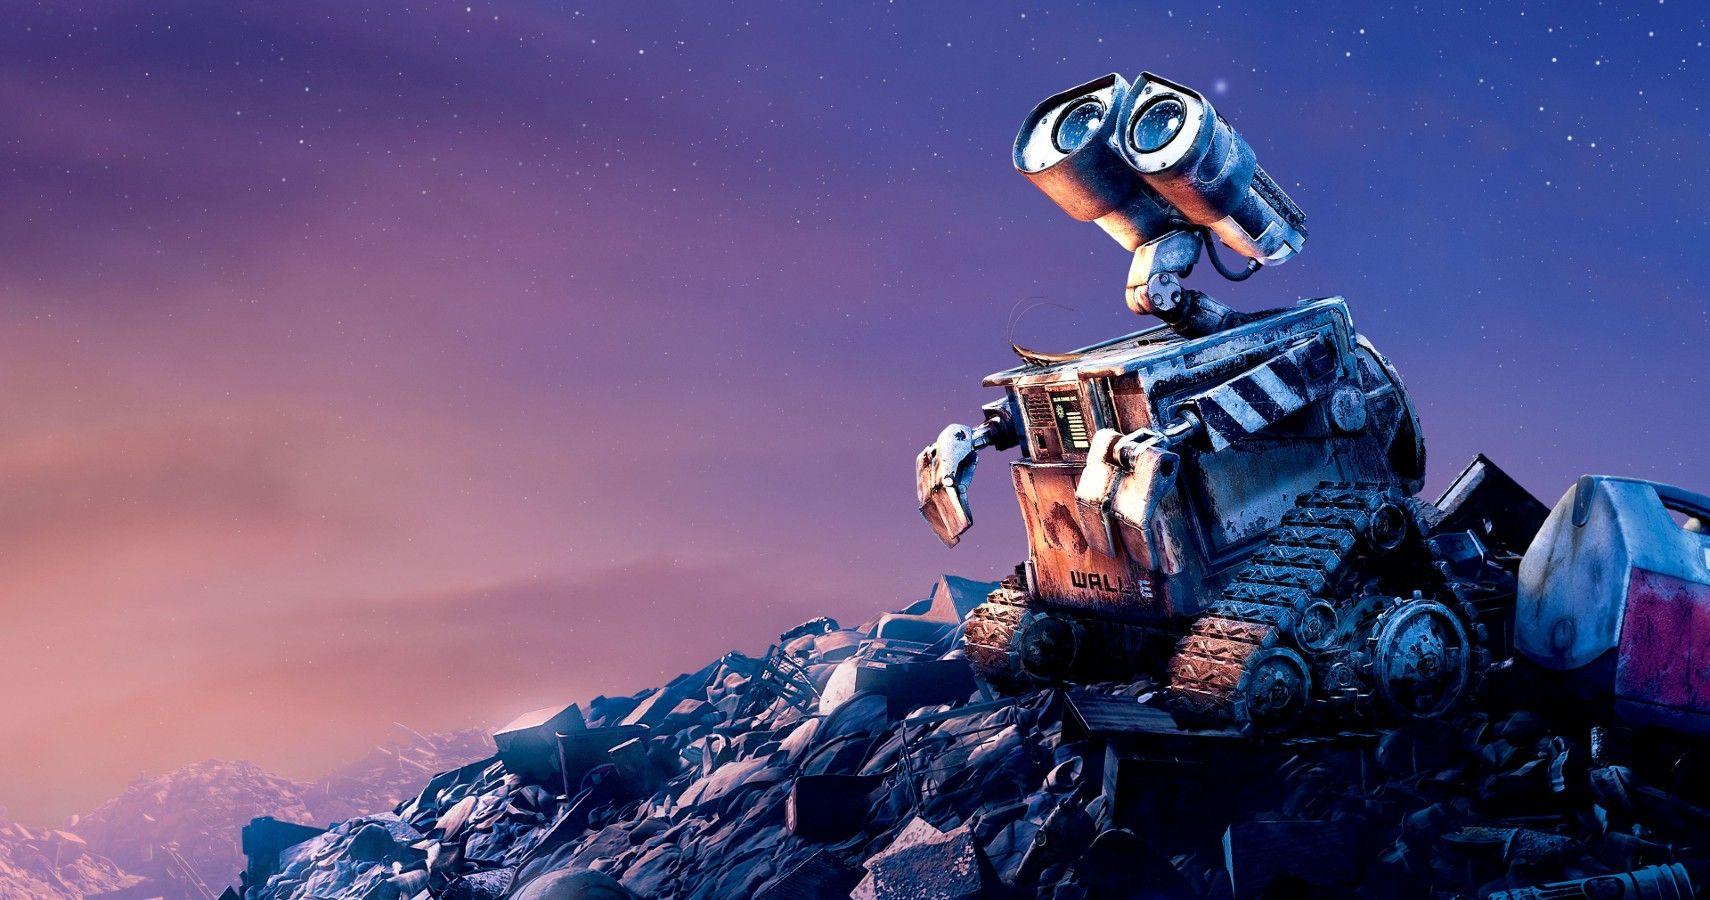 Wall-E Streaming